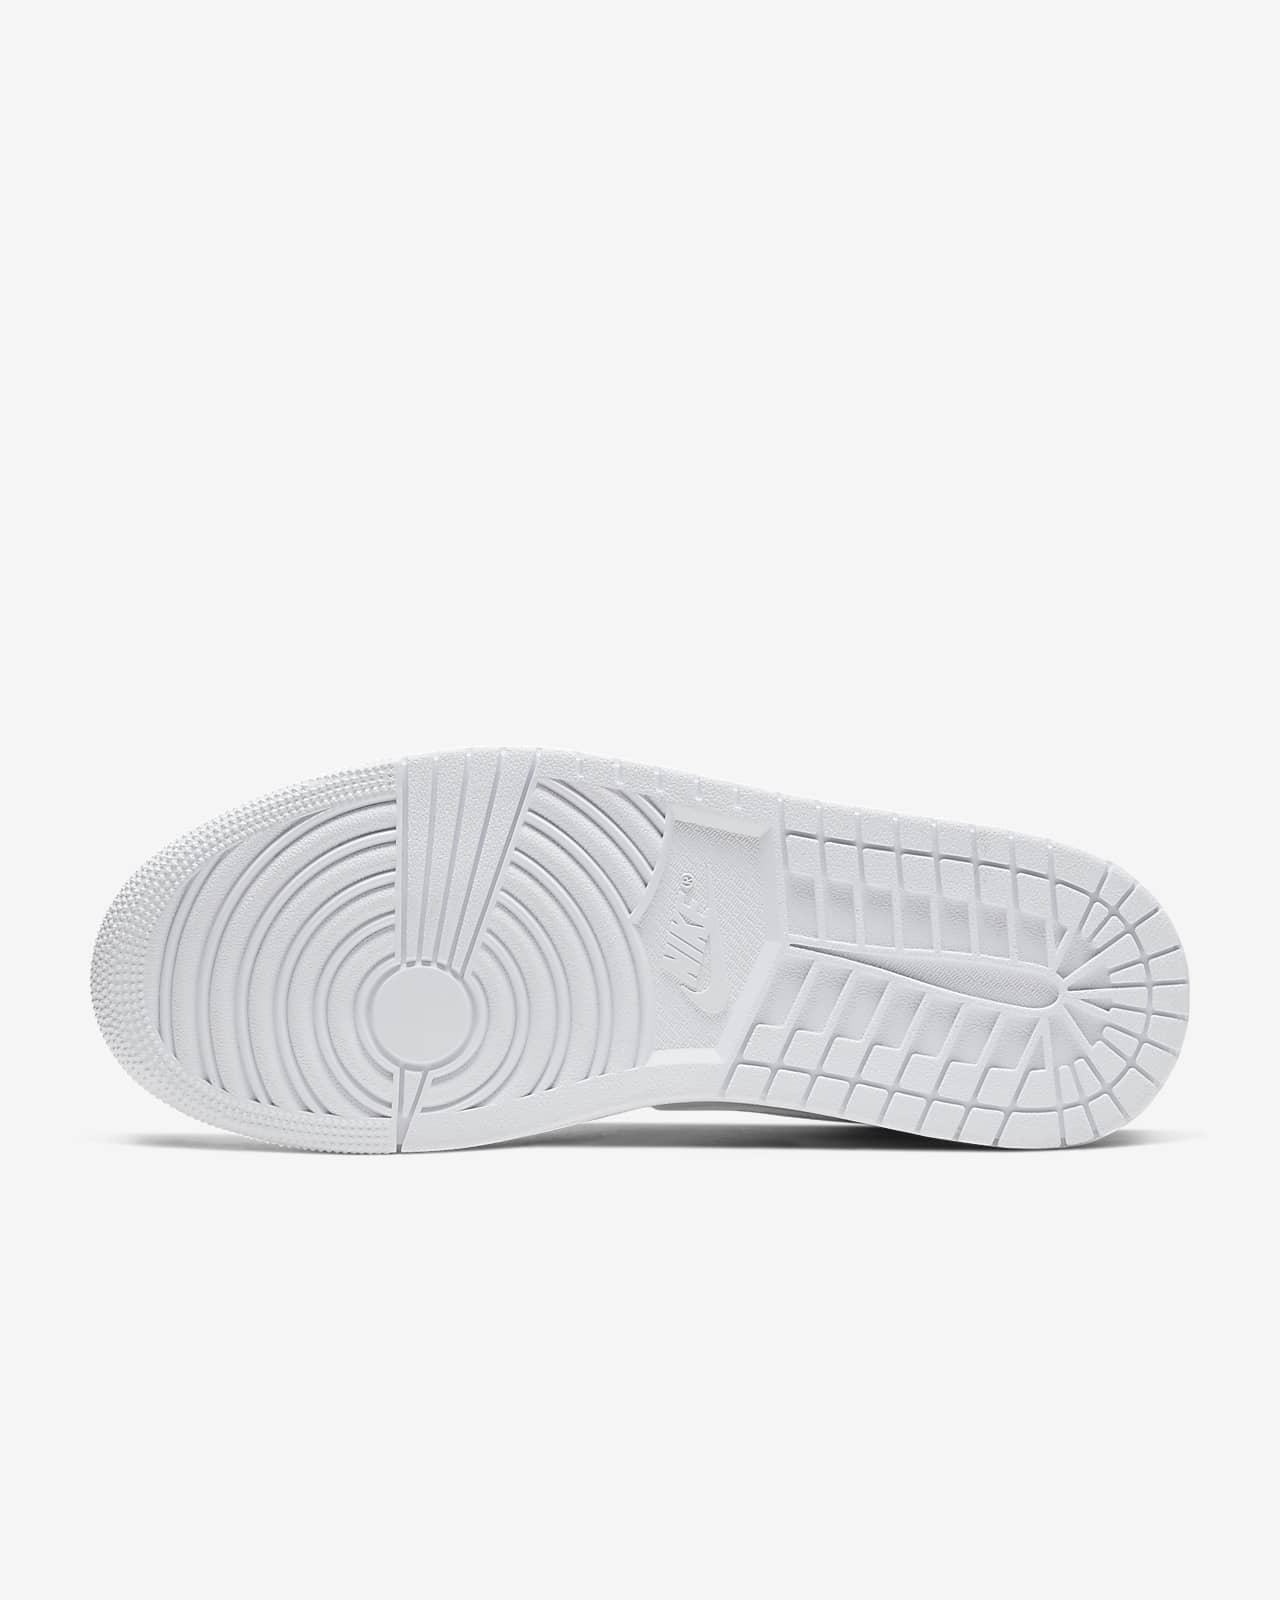 Air Jordan 1 Mid Shoes. Nike SA